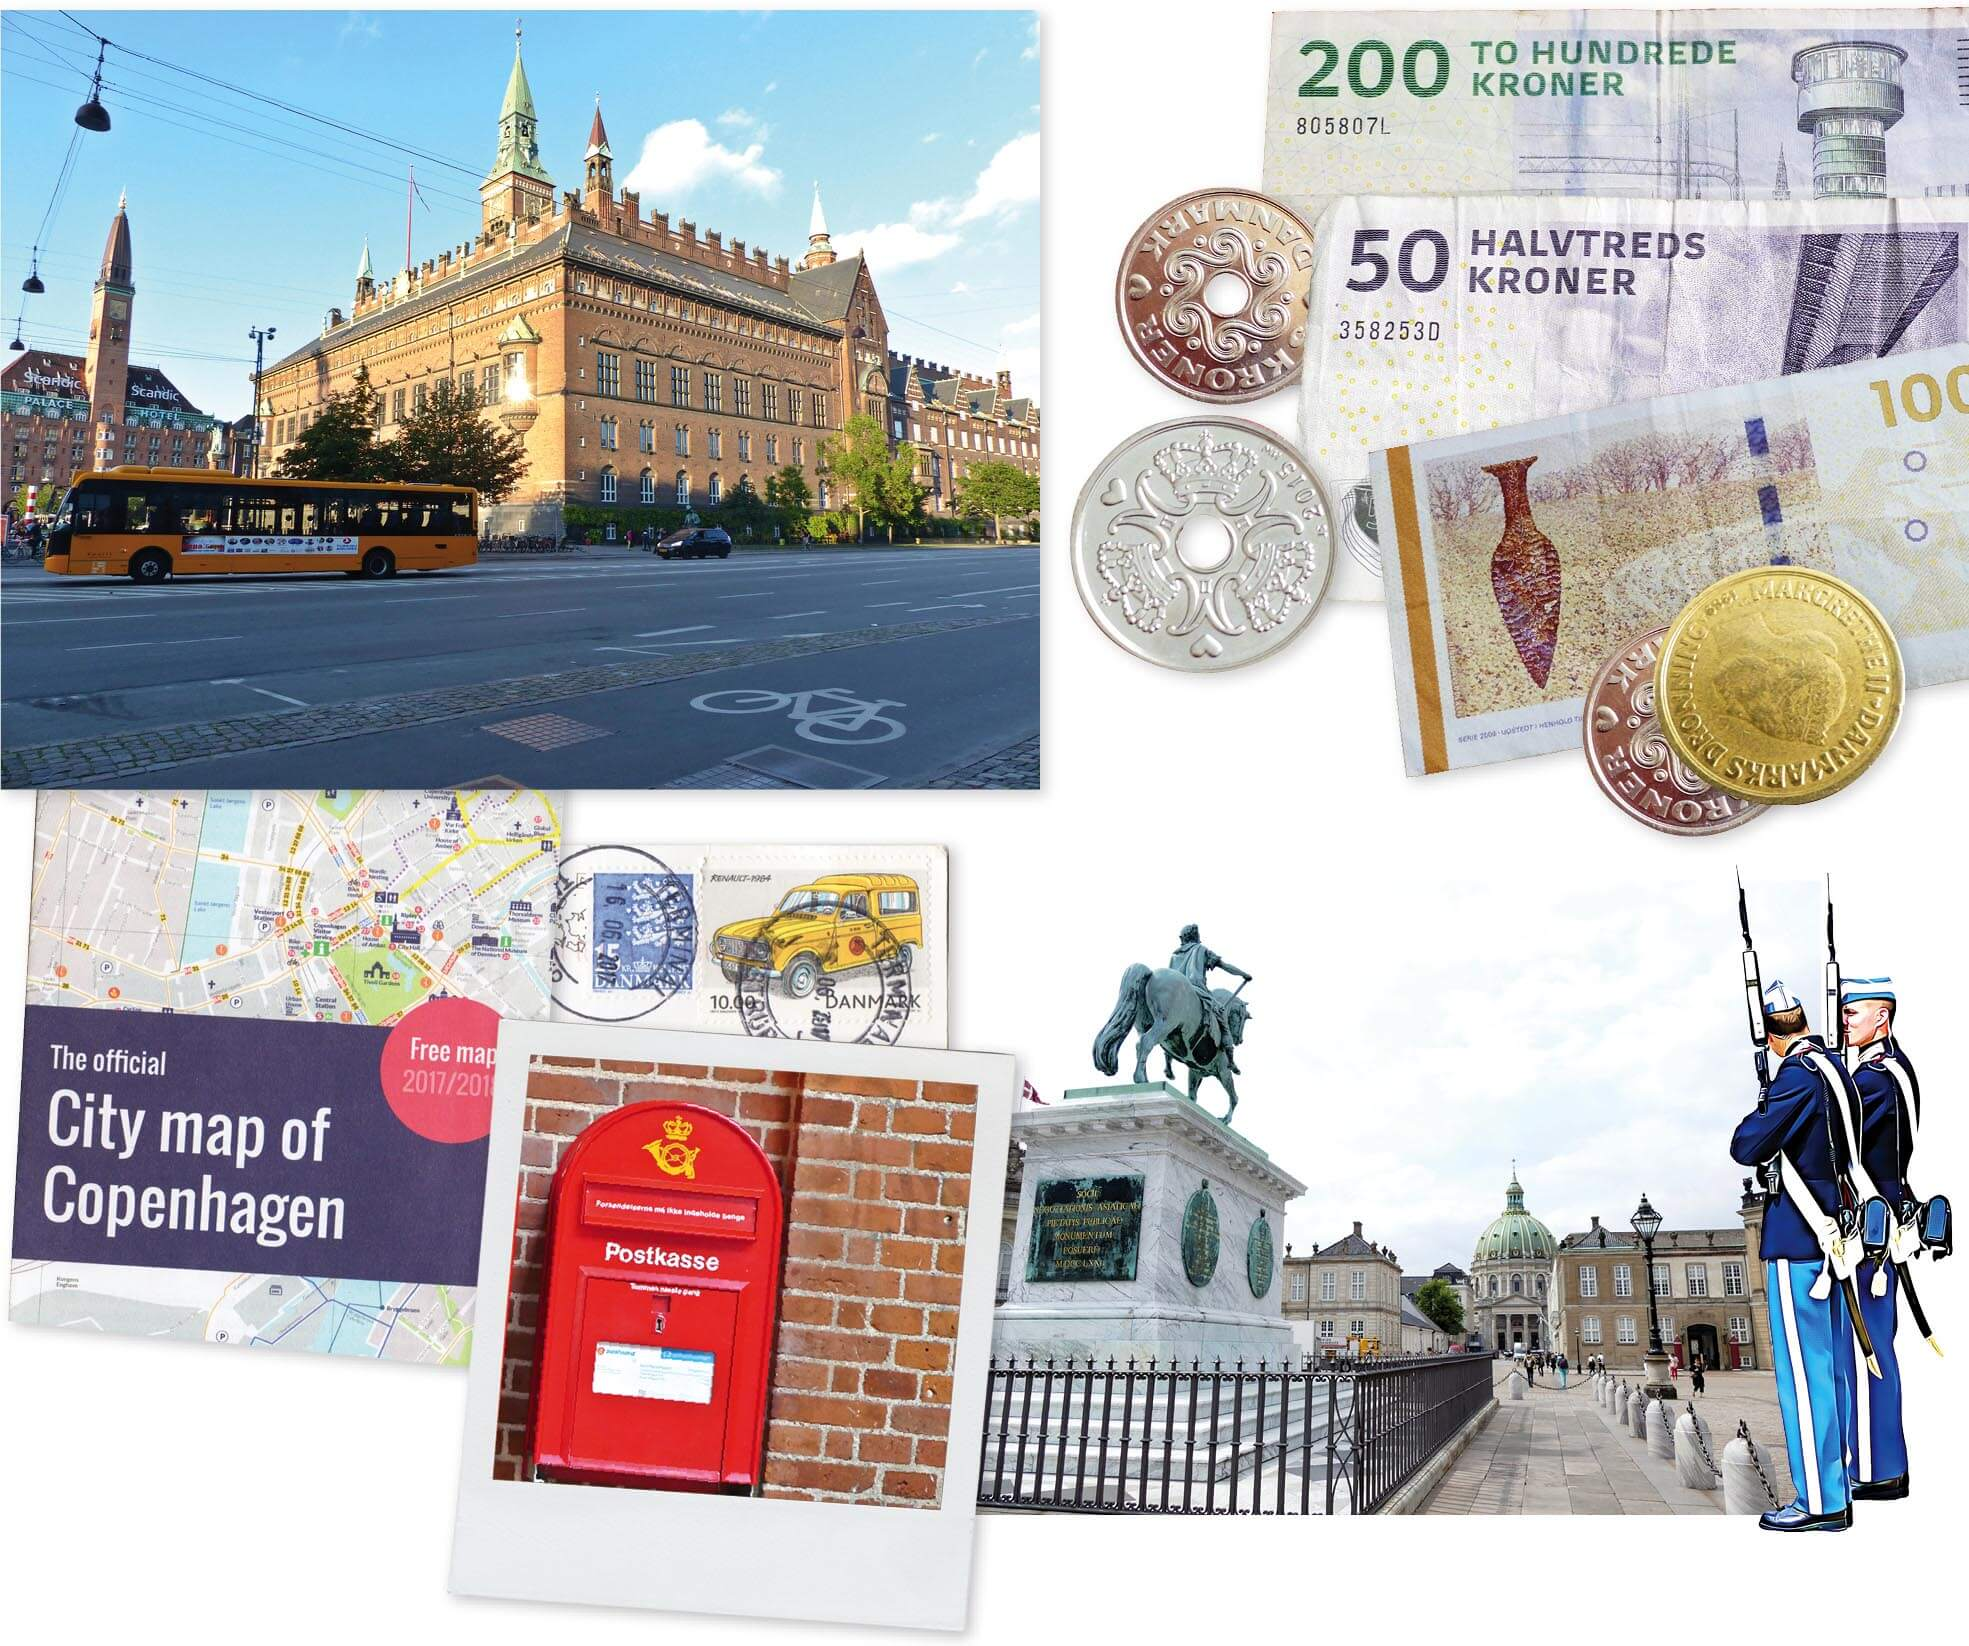 copenhague, danemark, Denmark, nyhavn, bateaux, canal, voyage, europe, kroner